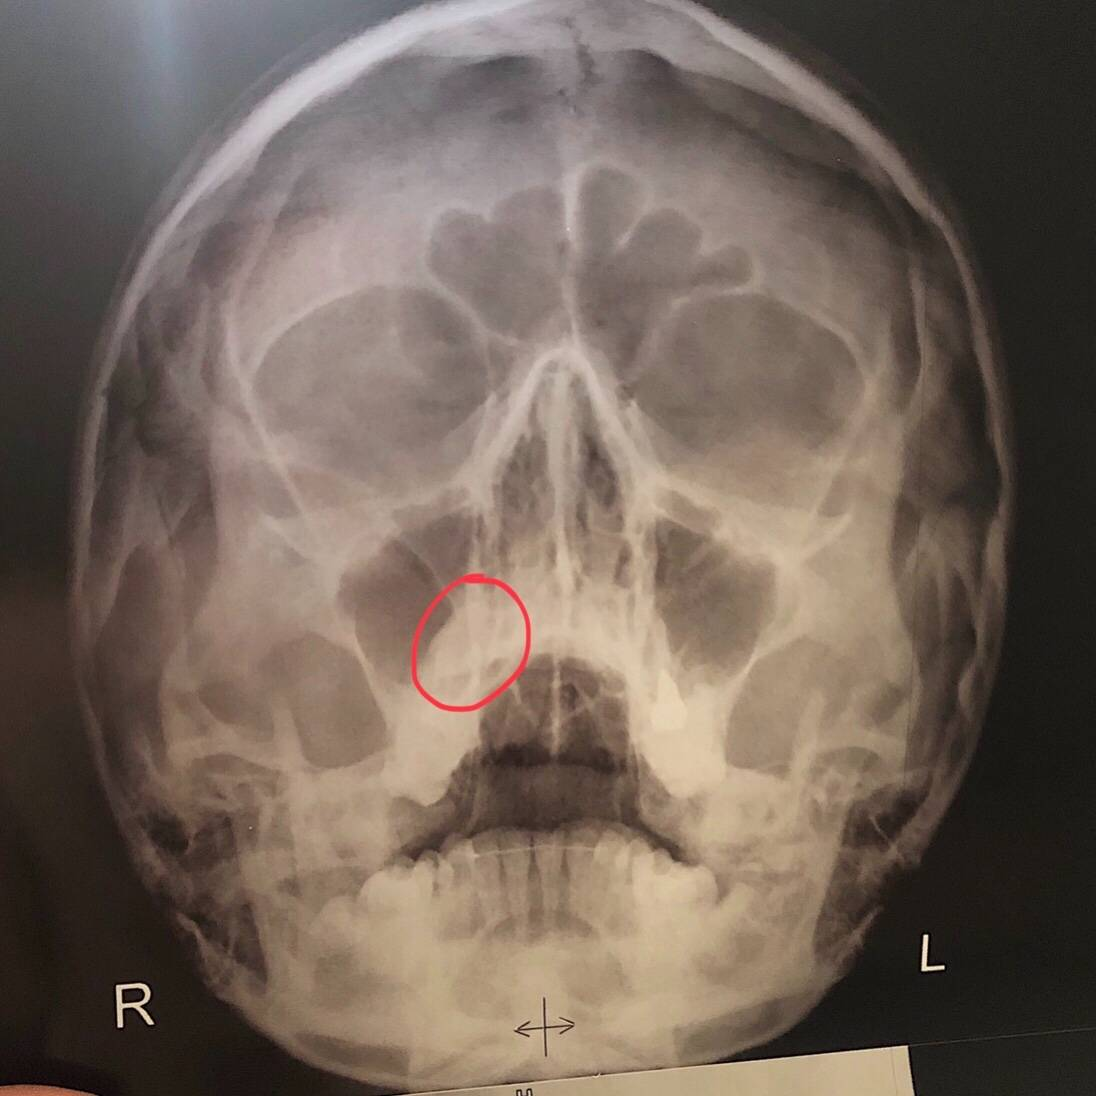 рентген придаточных пазух носа расшифровка